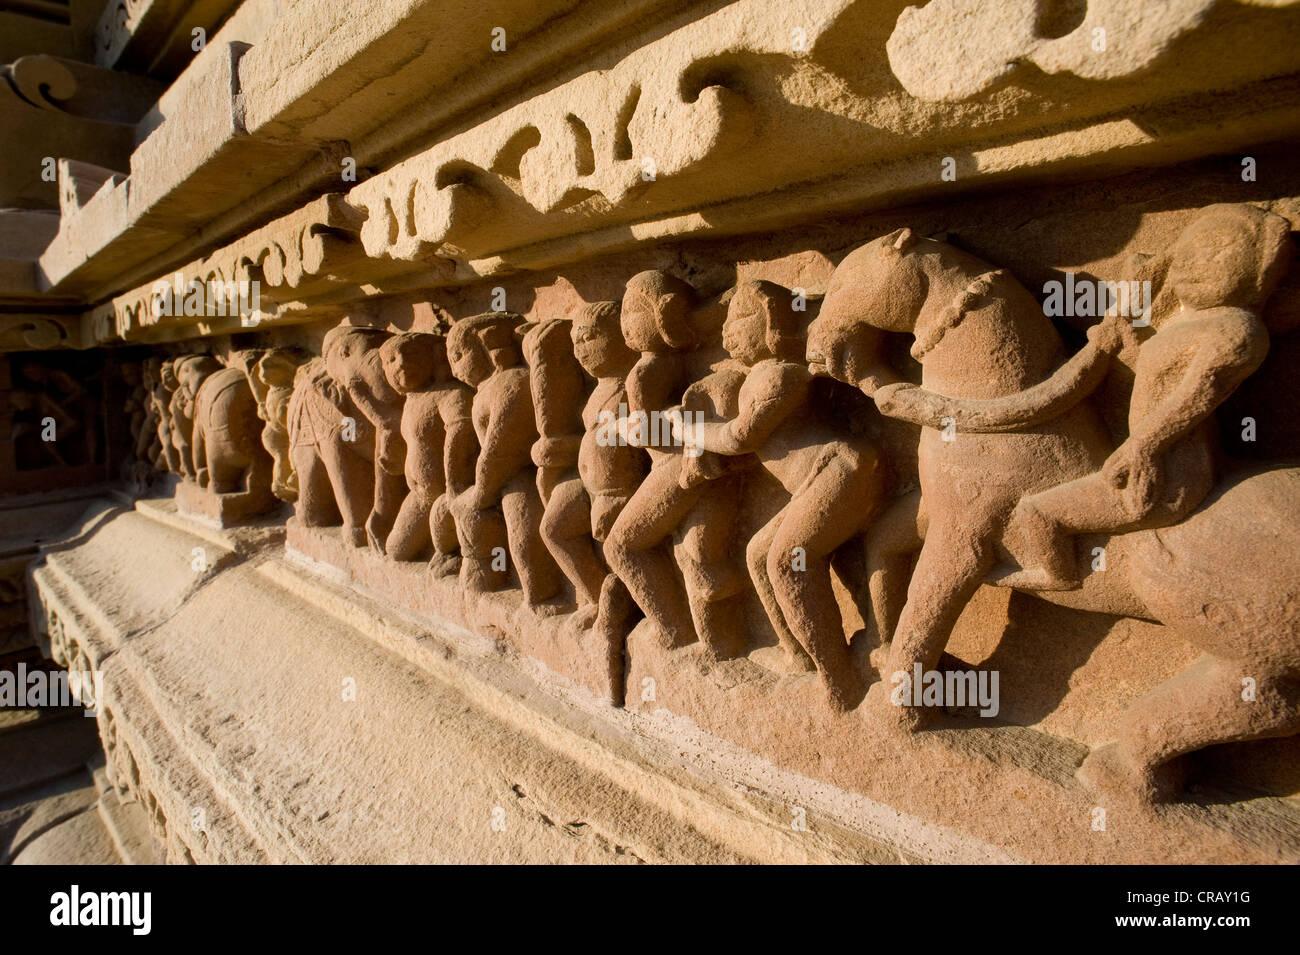 Relief, Khajuraho Group of Monuments, UNESCO World Heritage Site, Madhya Pradesh, India, Asia - Stock Image